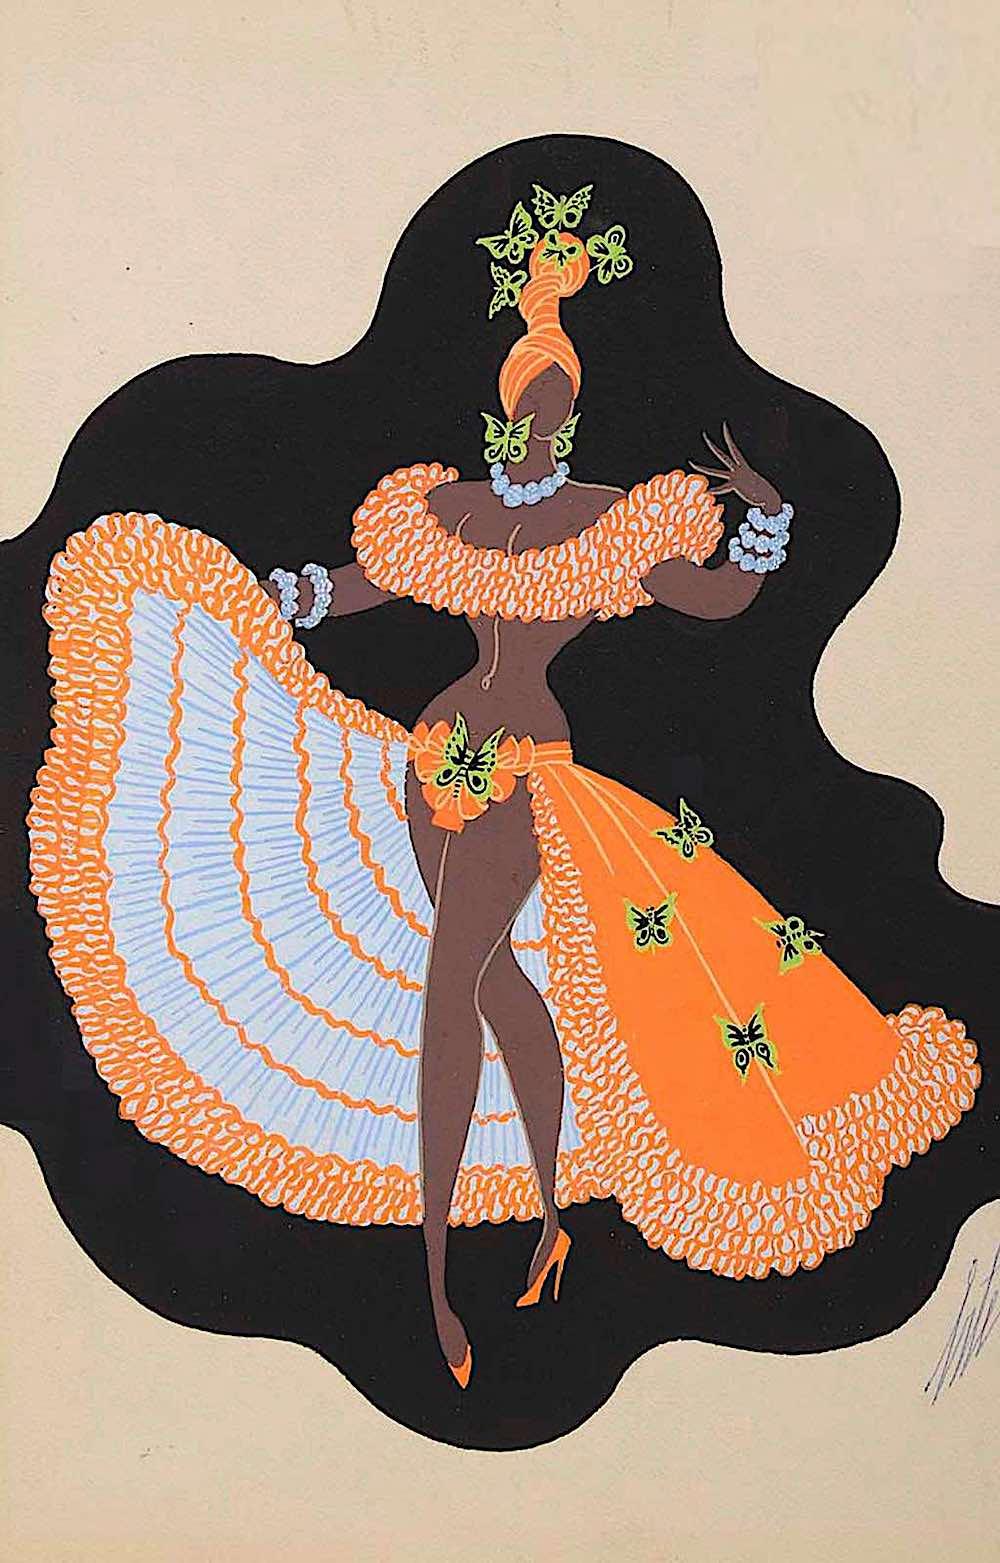 Erté, a festive Caribbean woman dancer